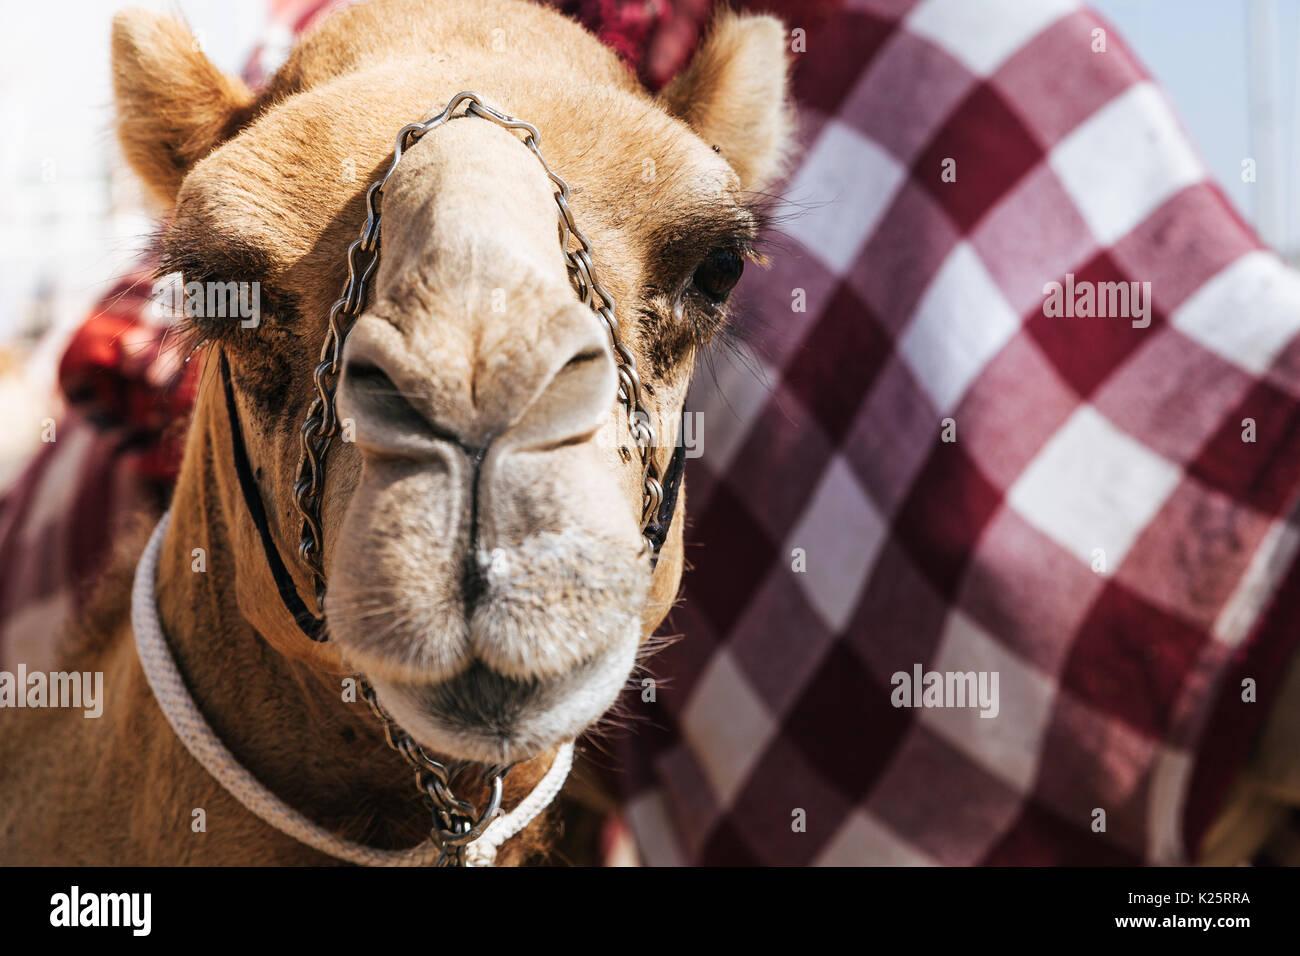 Portraitfotos von einem Kamel am Dubai camel Racing Club, VAE Stockbild